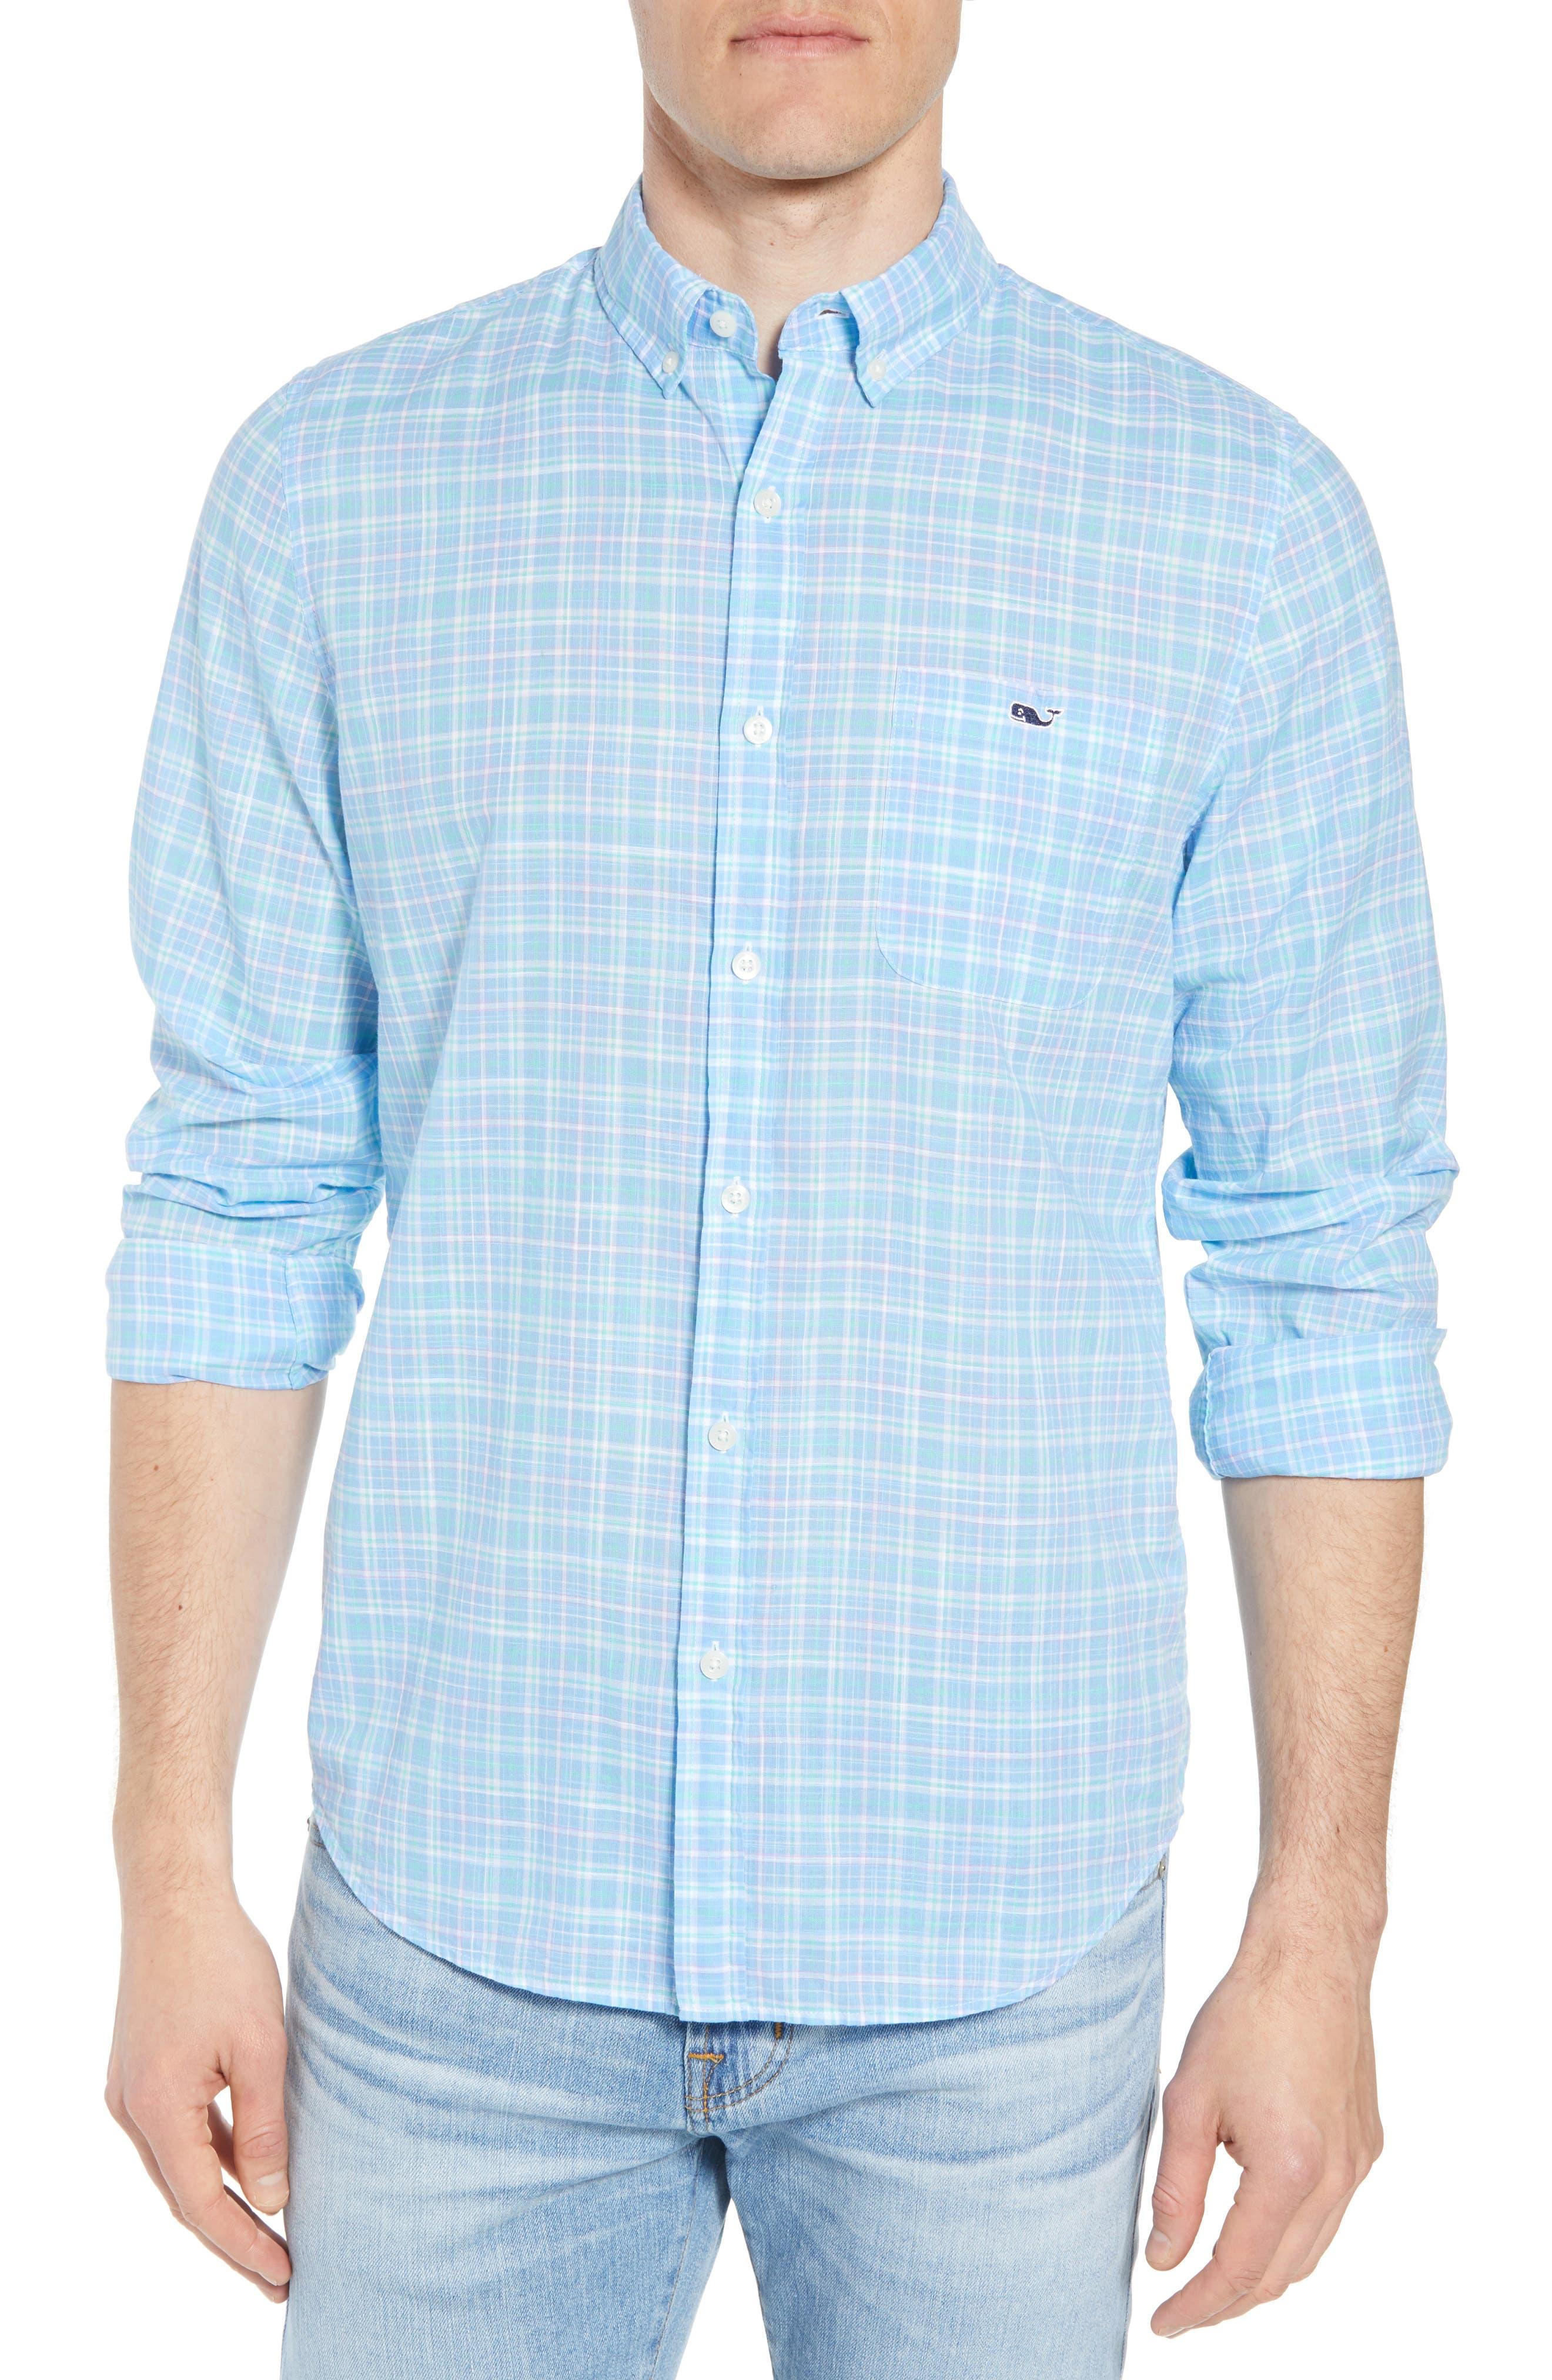 Stoney Hill Tucker Classic Fit Plaid Sport Shirt,                             Main thumbnail 1, color,                             415